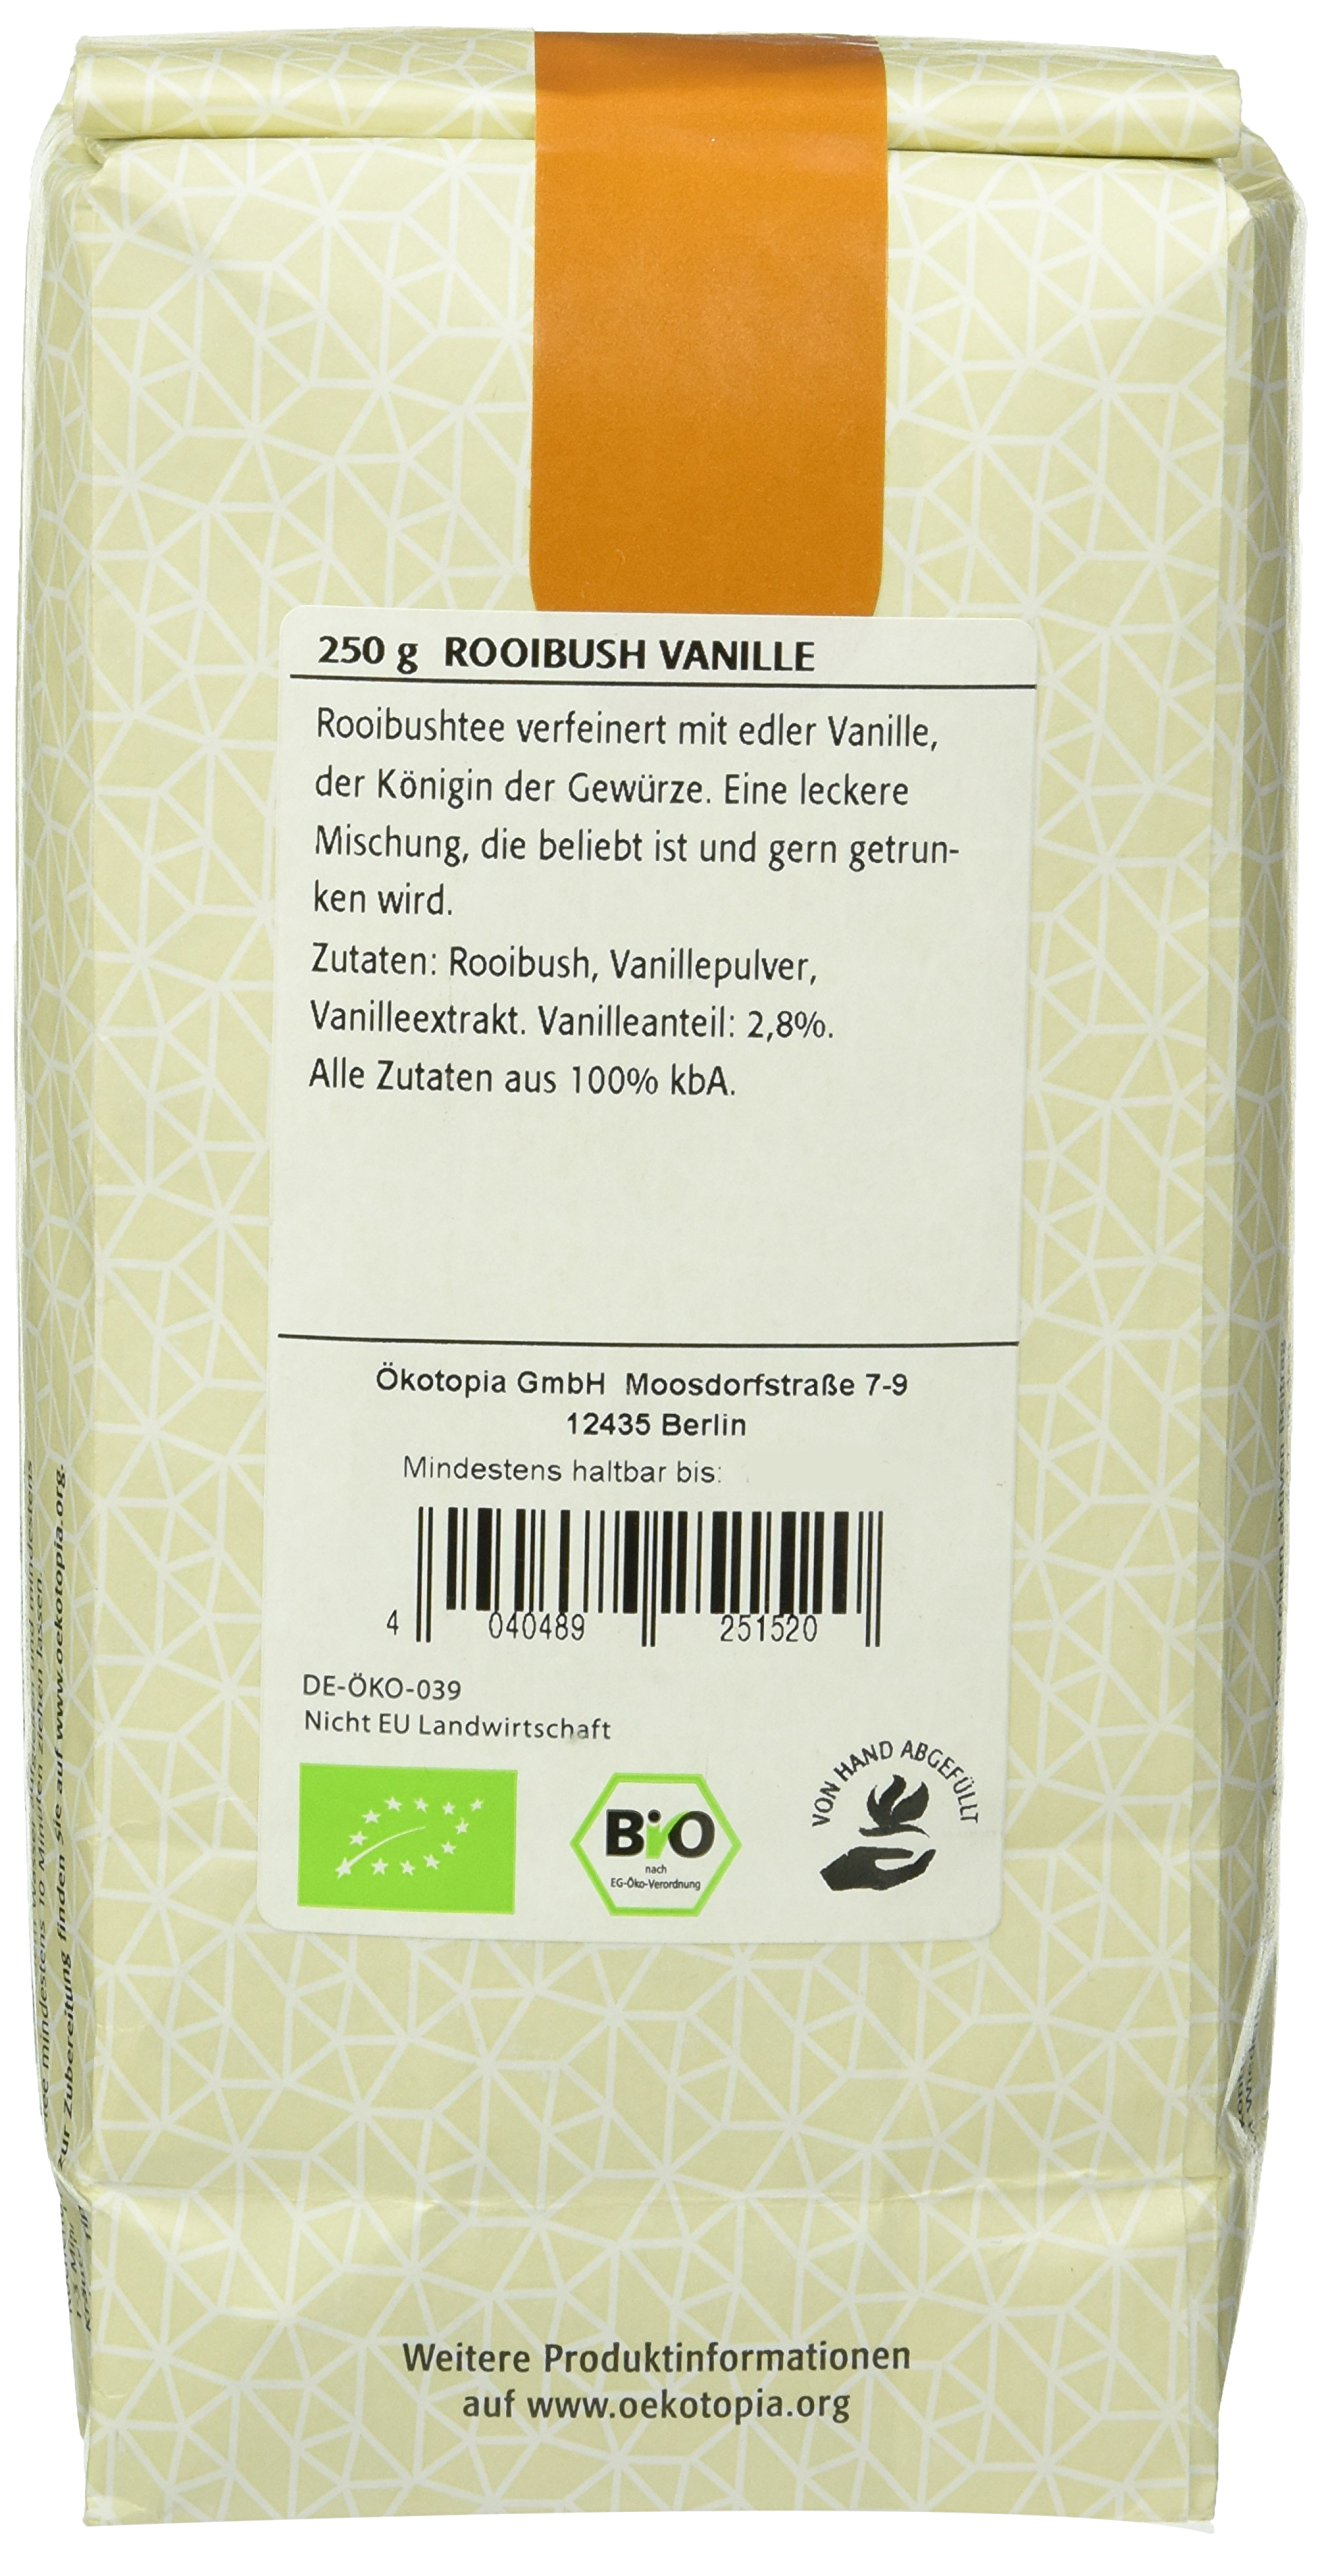 kotopia-Rooibush-Vanille-1er-Pack-1-x-250-g